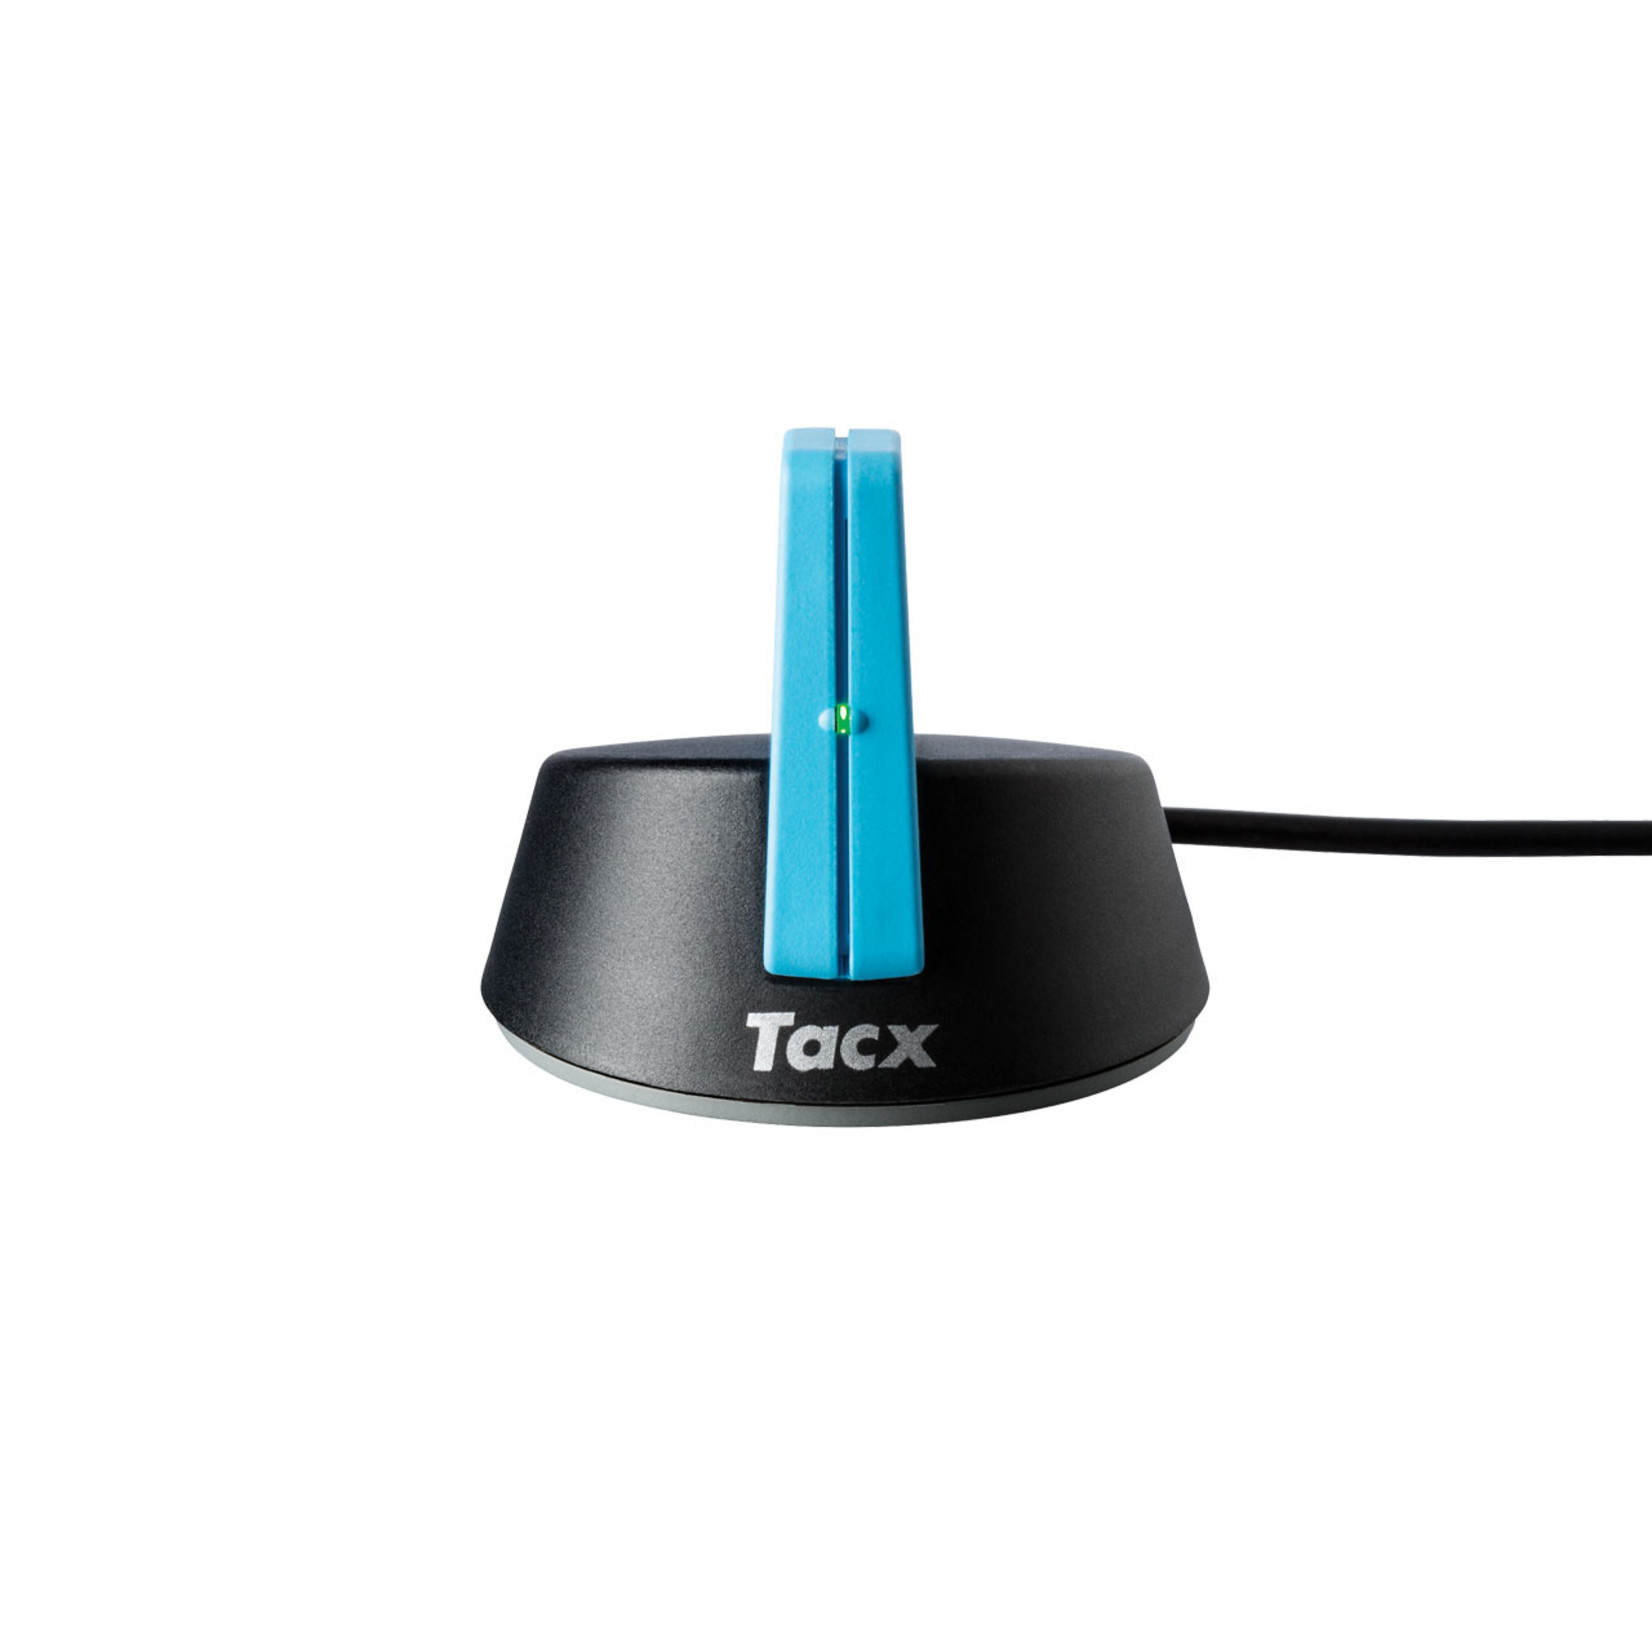 Tacx ® USB ANT+ Antenna